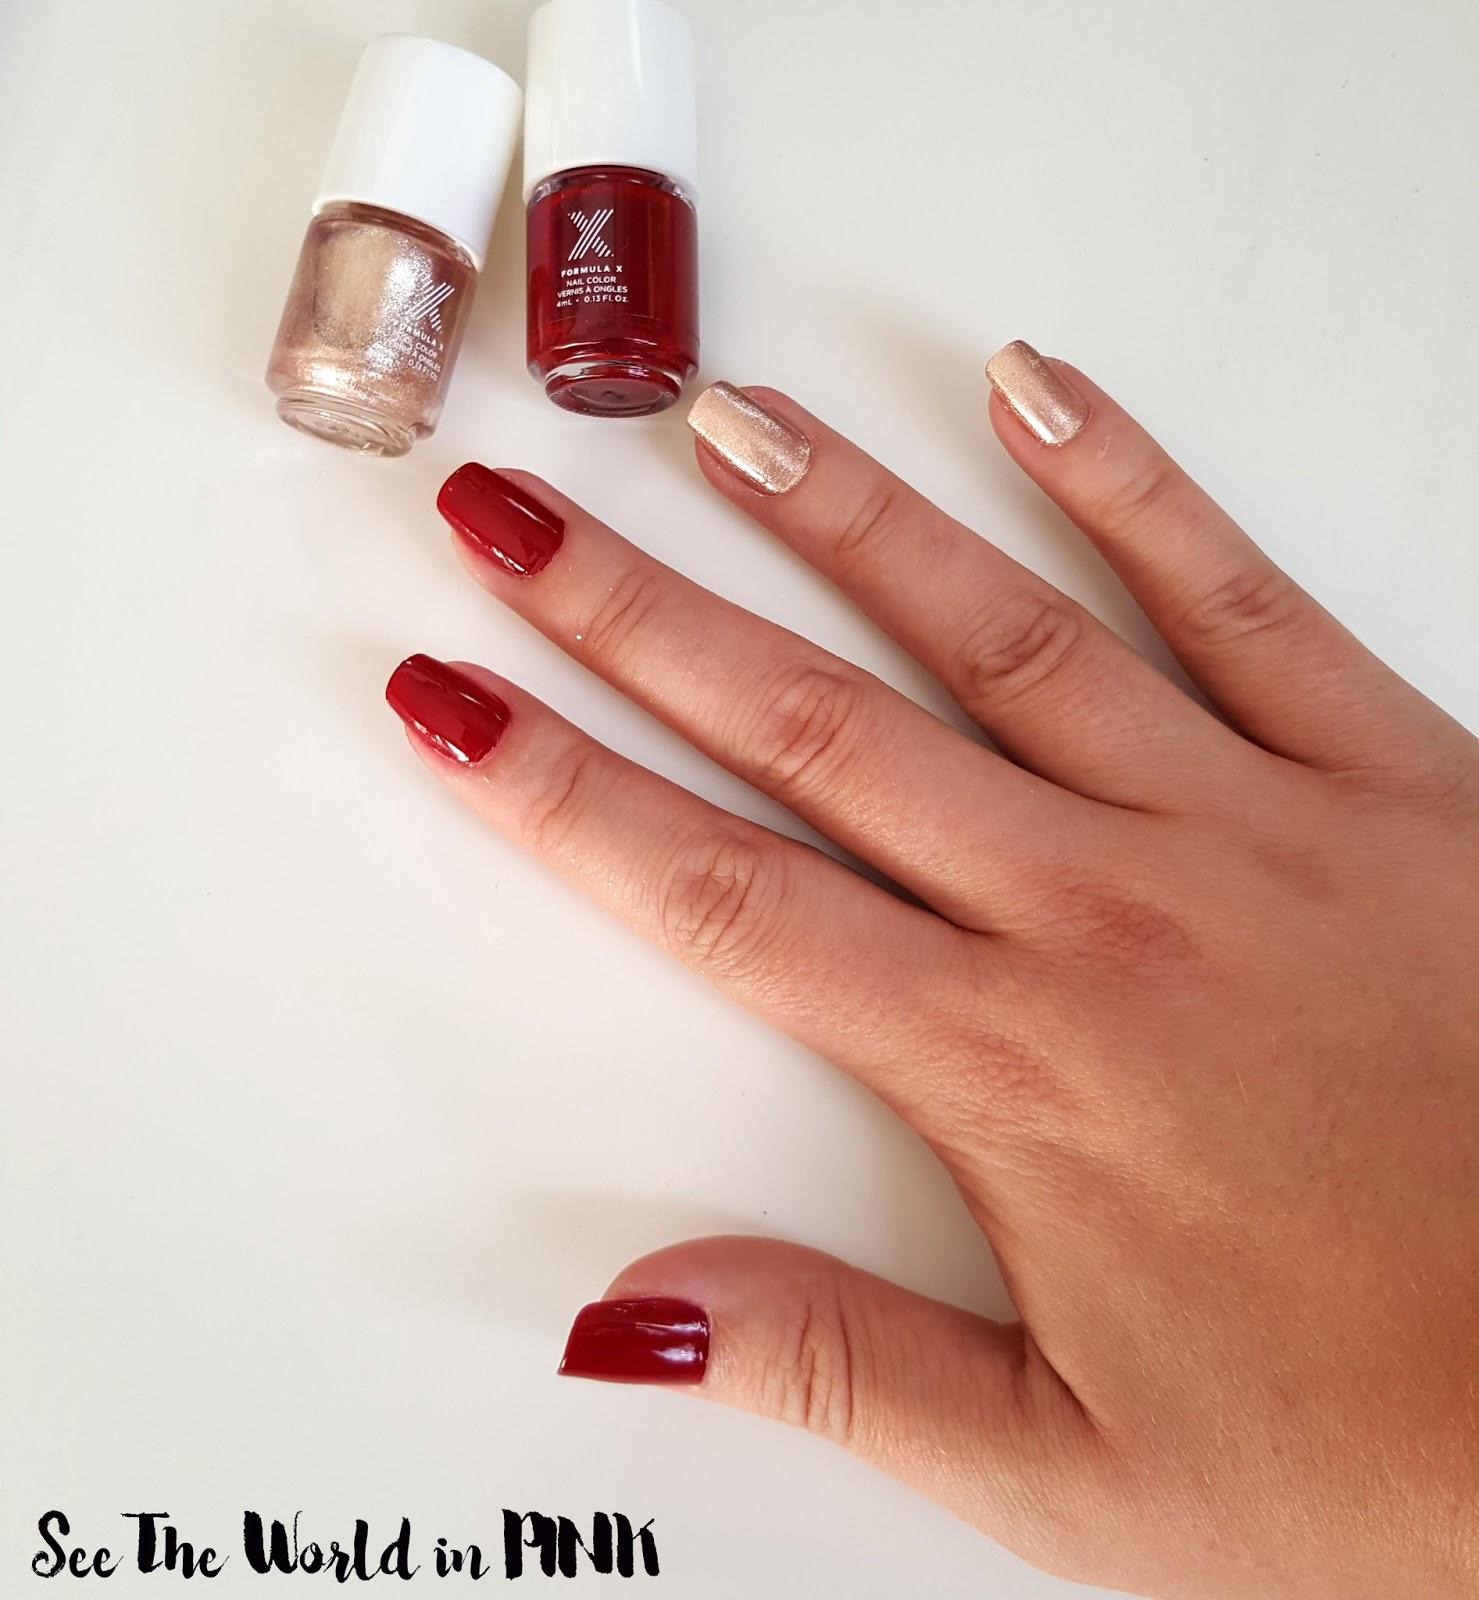 Formula X Nail Colours - Ignite and Revved Up!